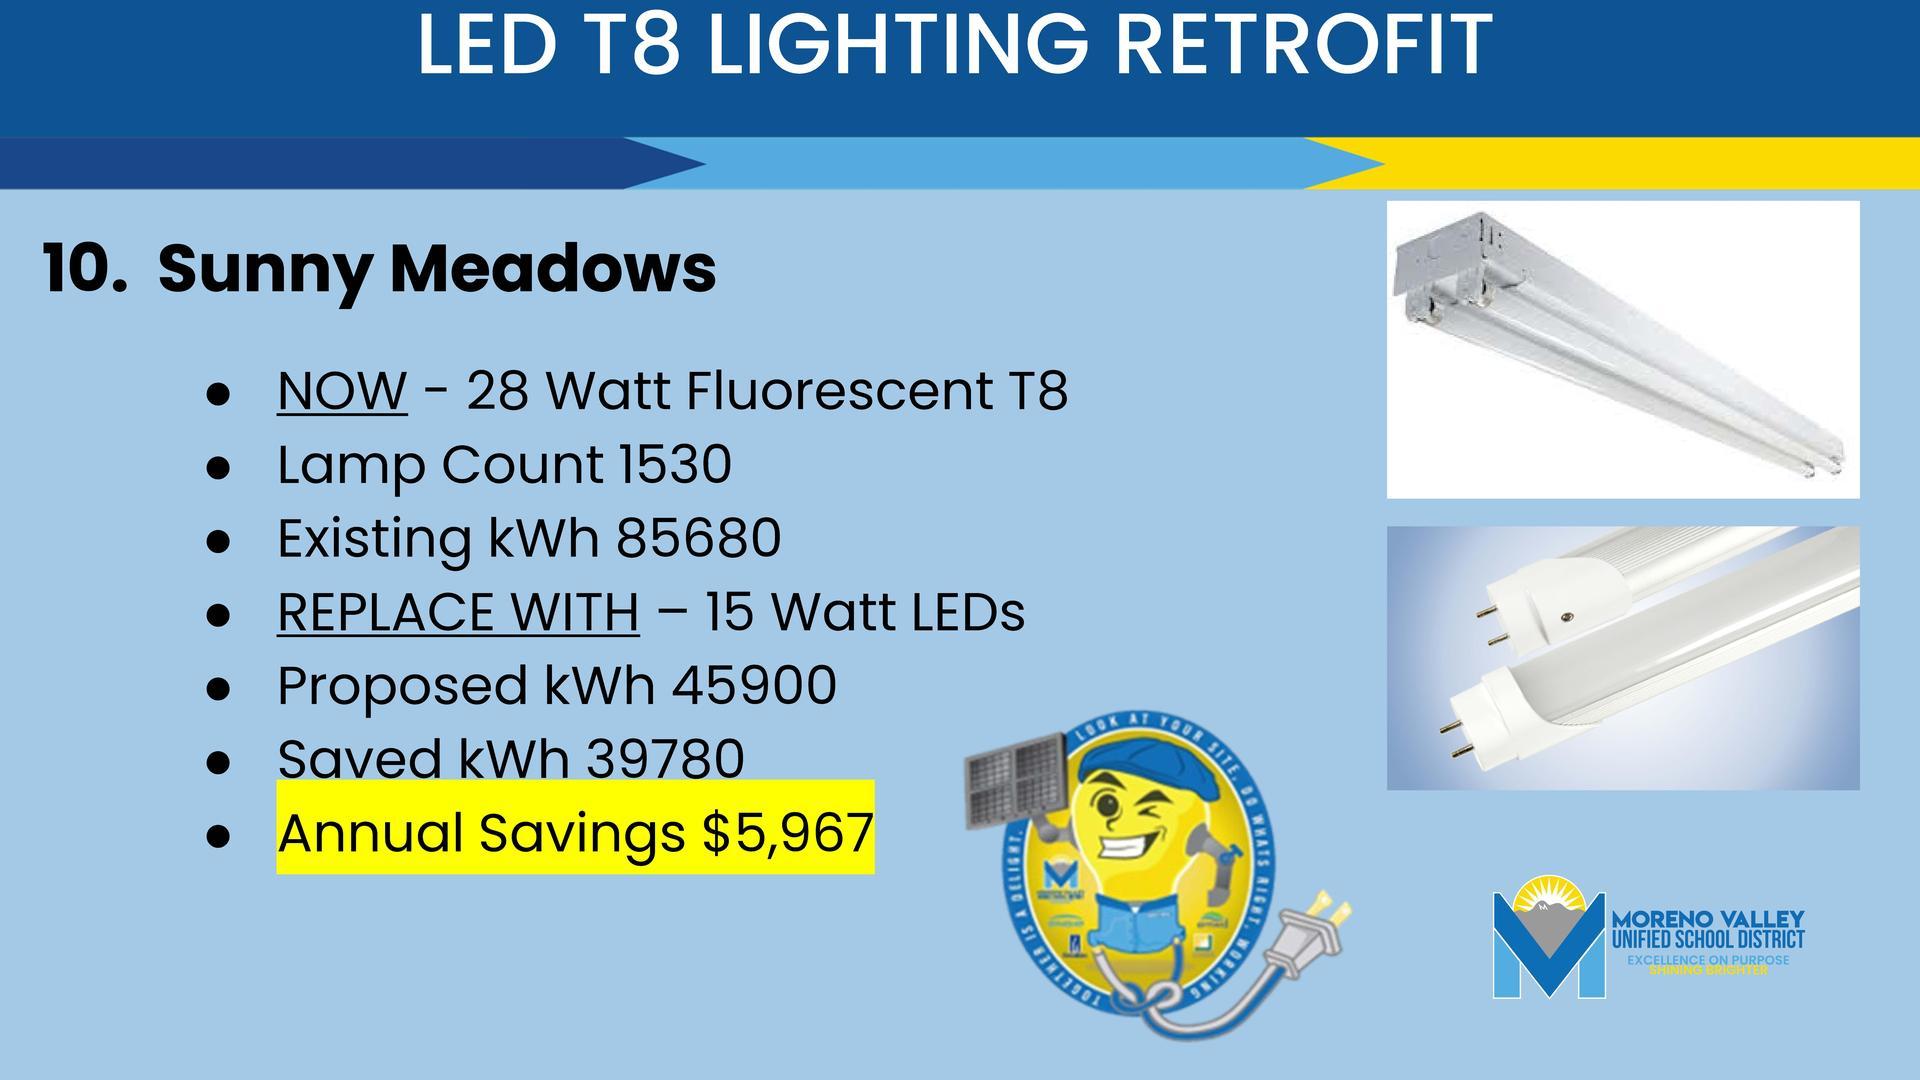 Image showing savings for LED retrofit